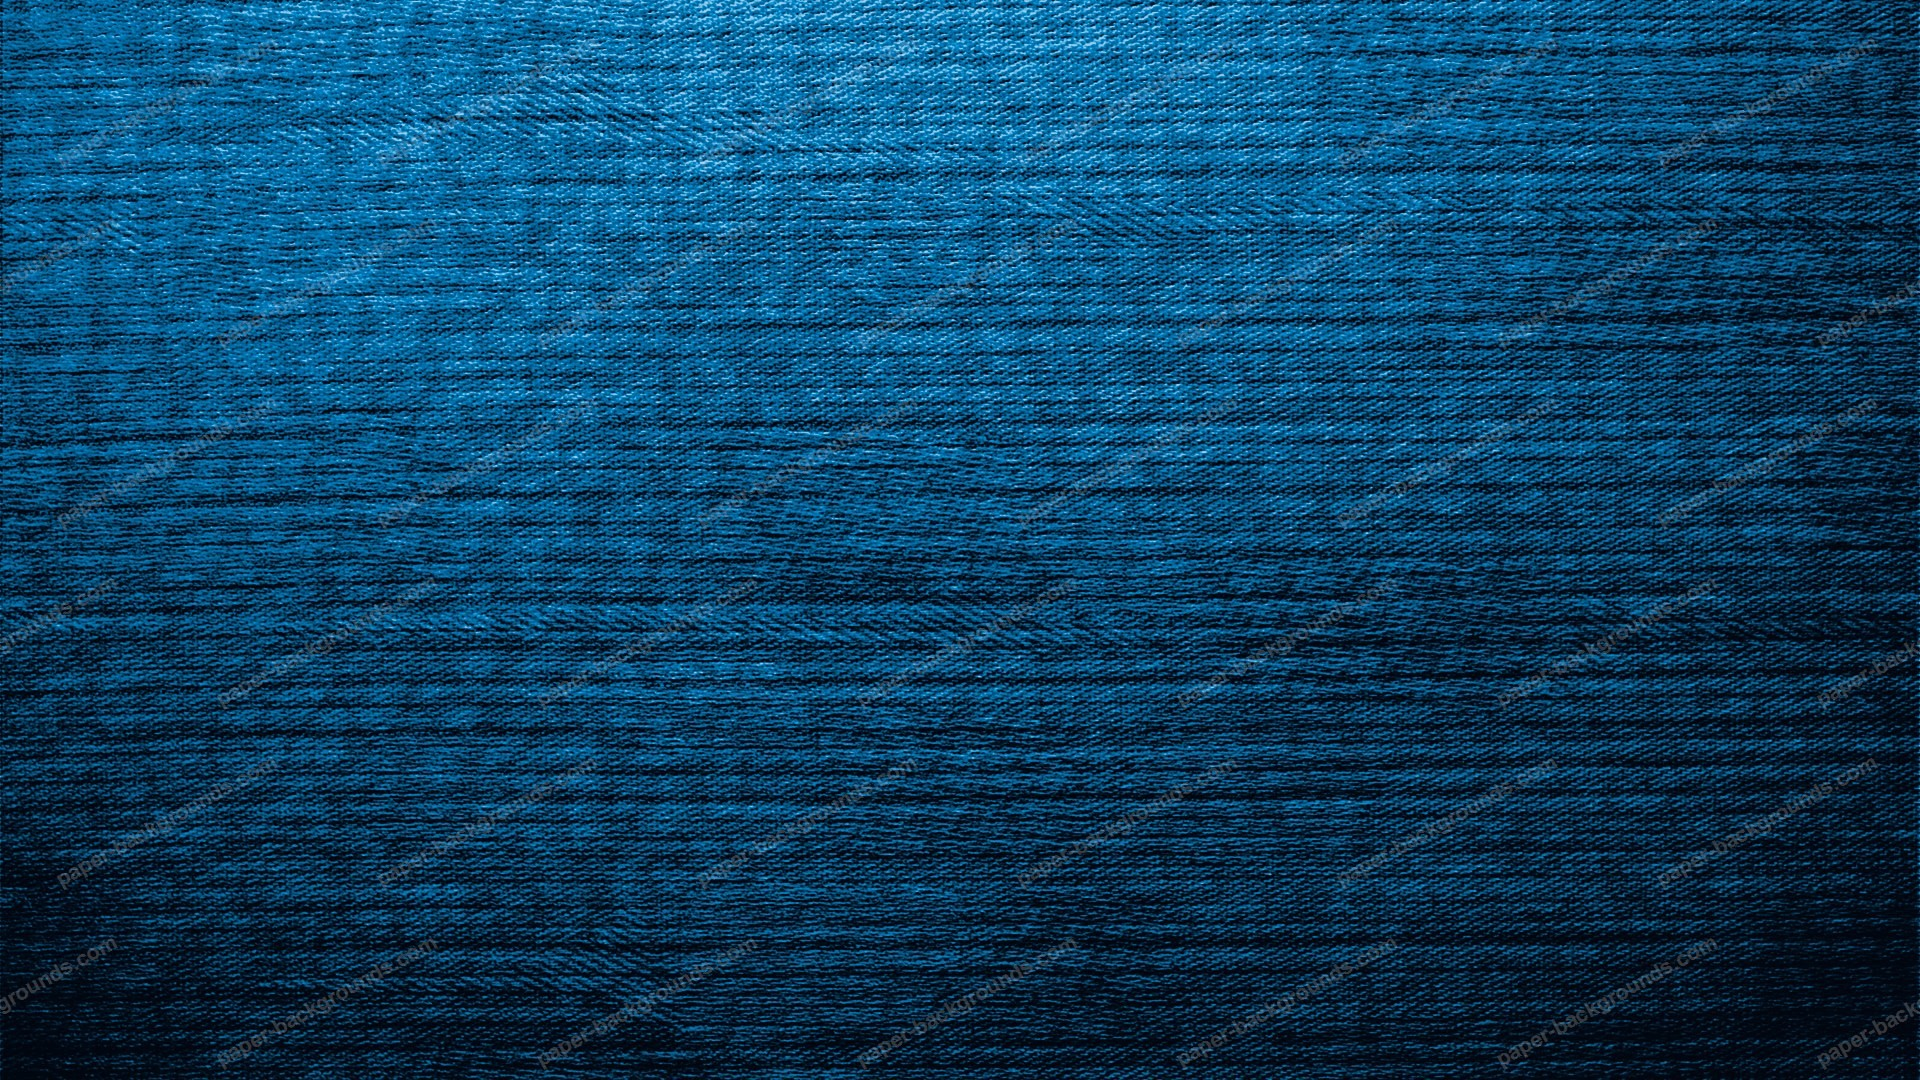 Blue Grunge Background Hd Paper backgrounds dark blue grunge #10197